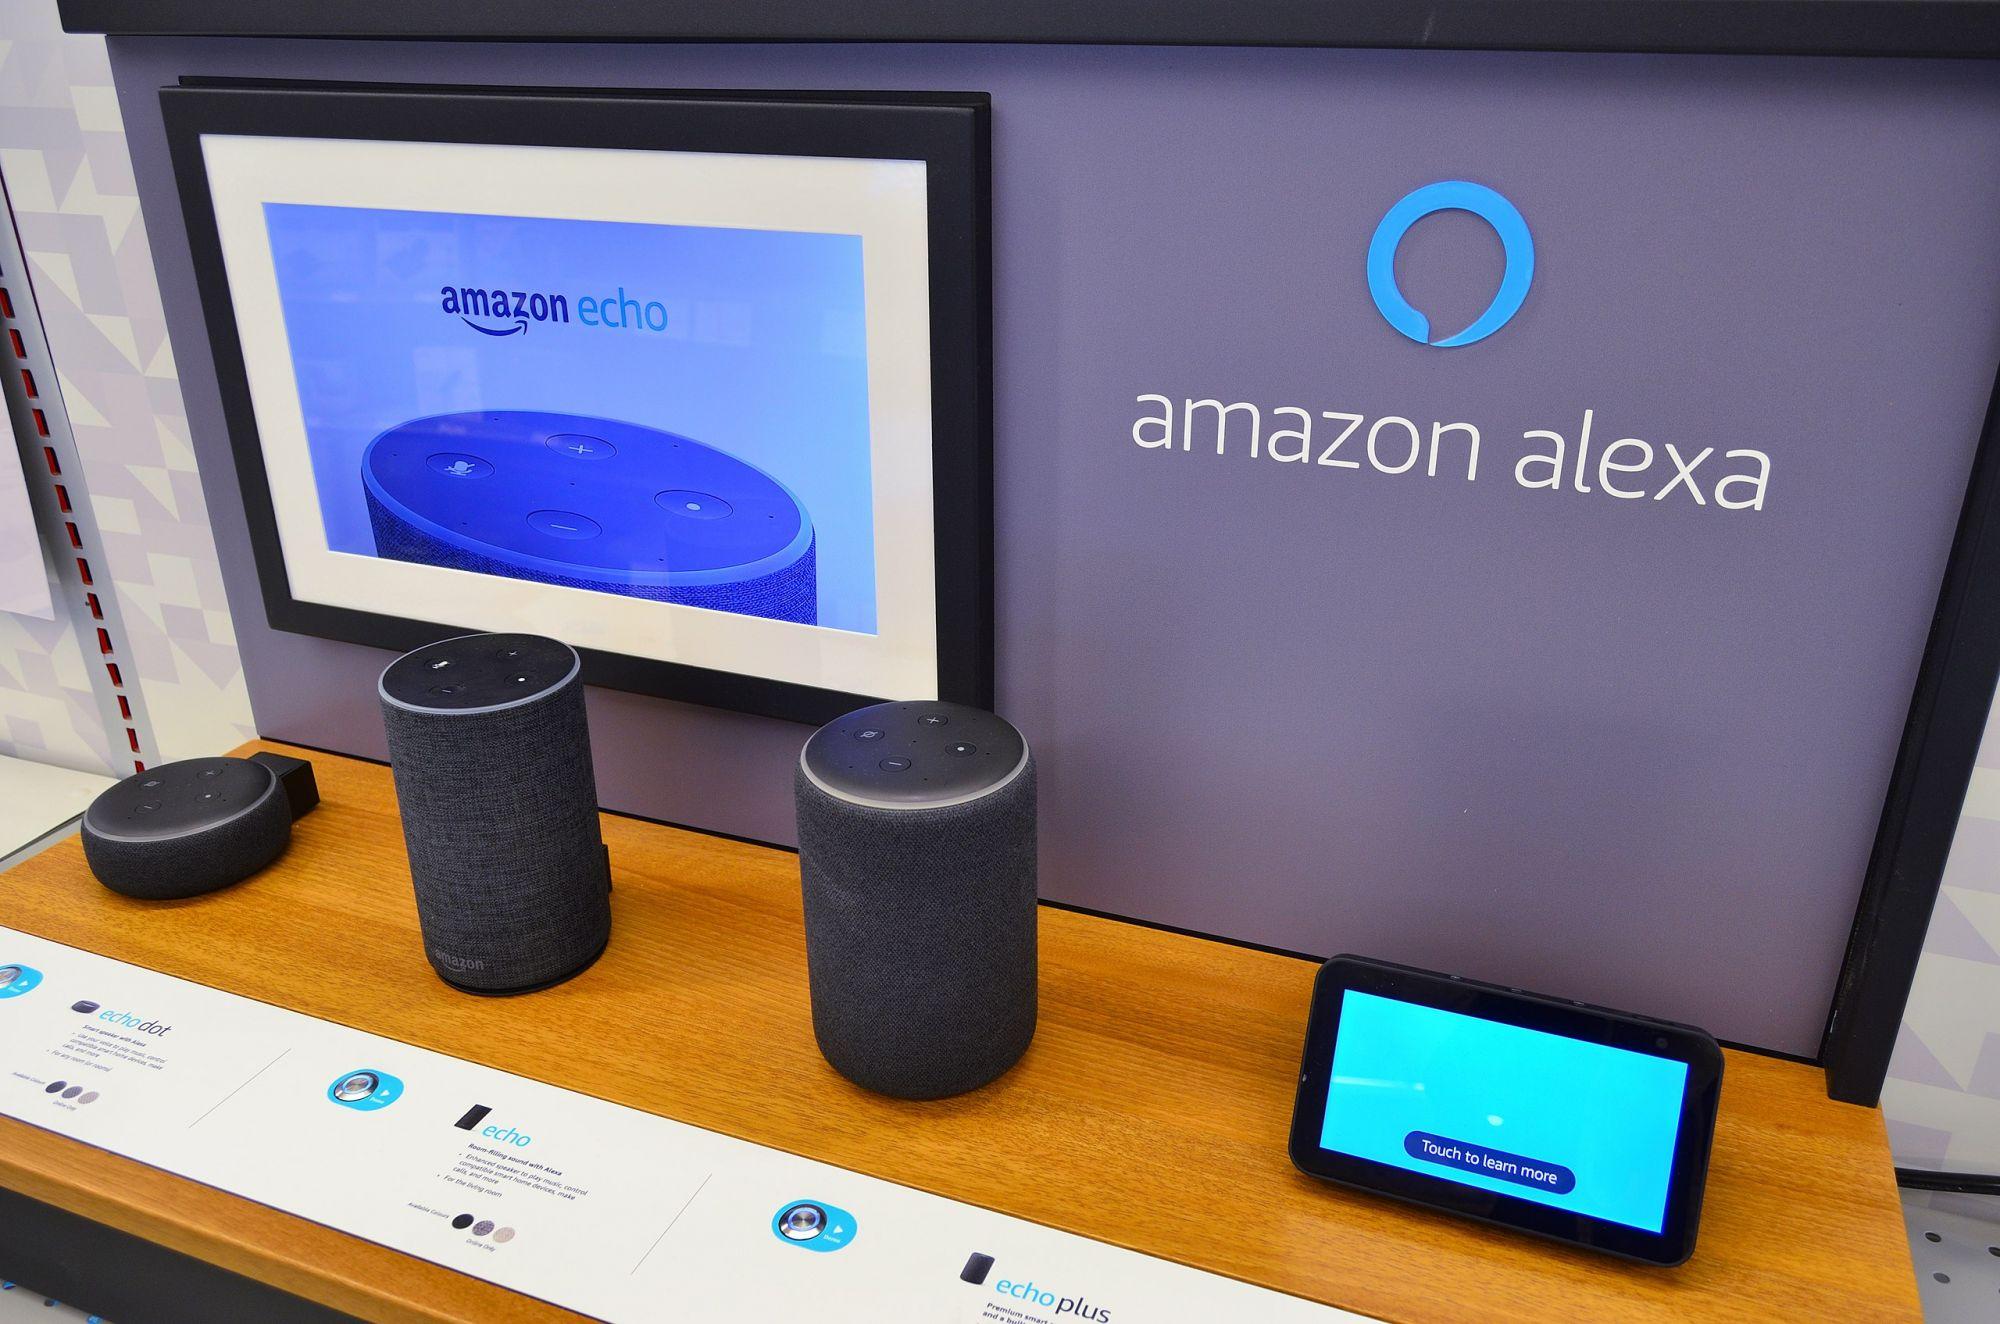 Телевизор под брендом <i>Amazon </i>появится вСША